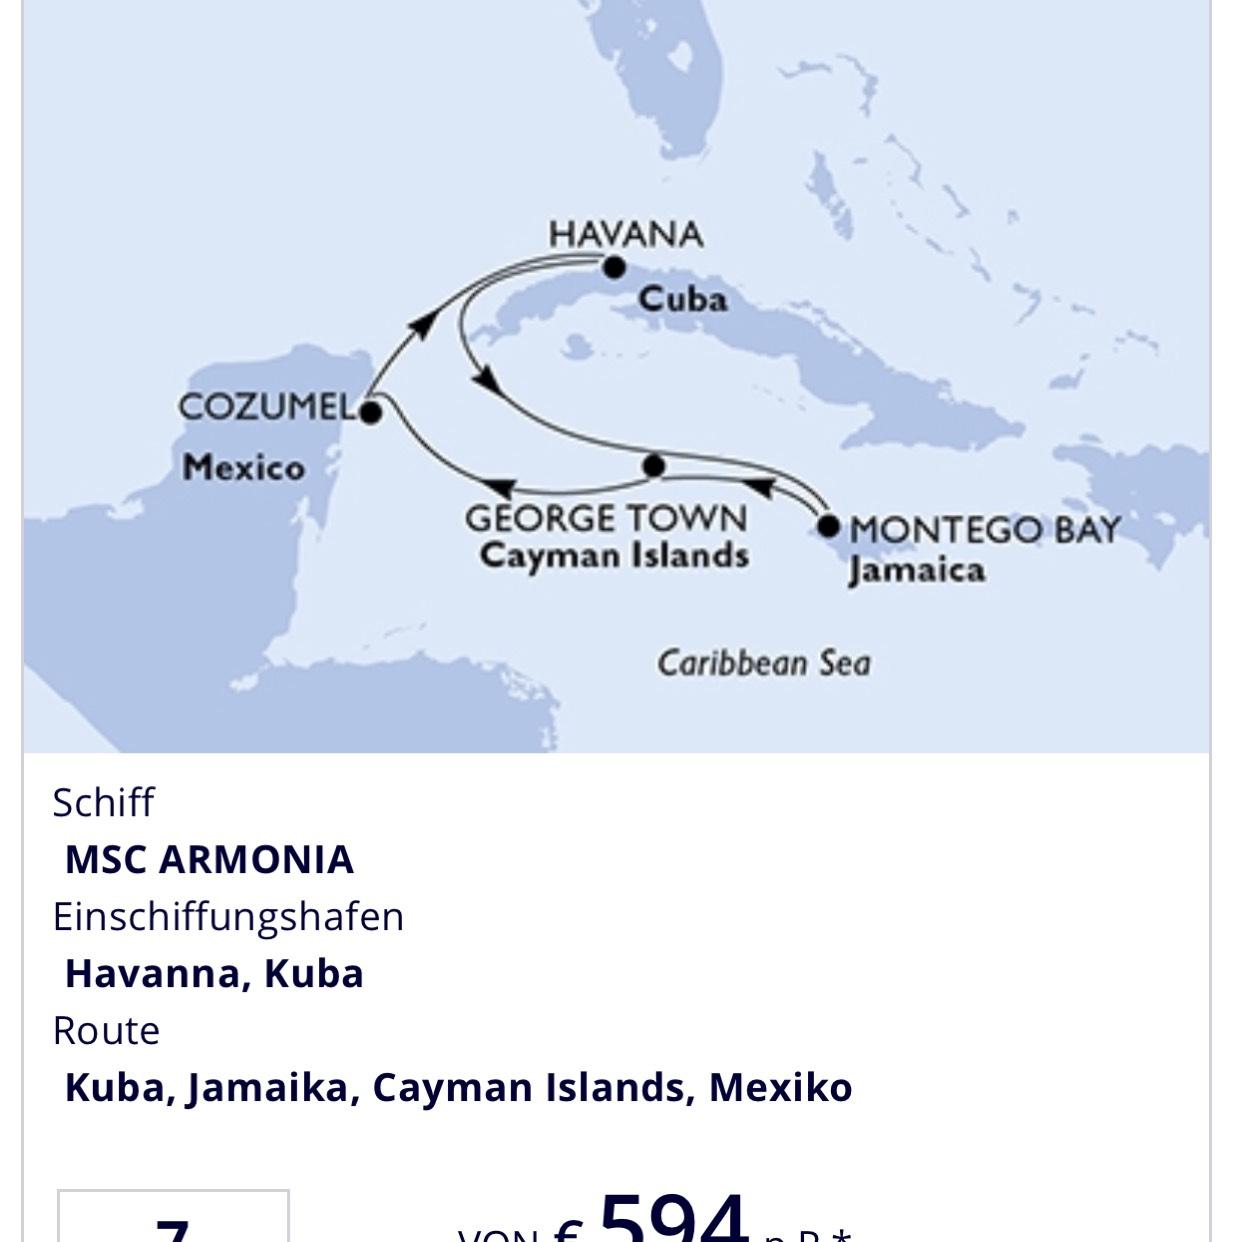 Flug mit Lufthansa nach Kuba + 1 Woche MSC Kreuzfahrt Karibik